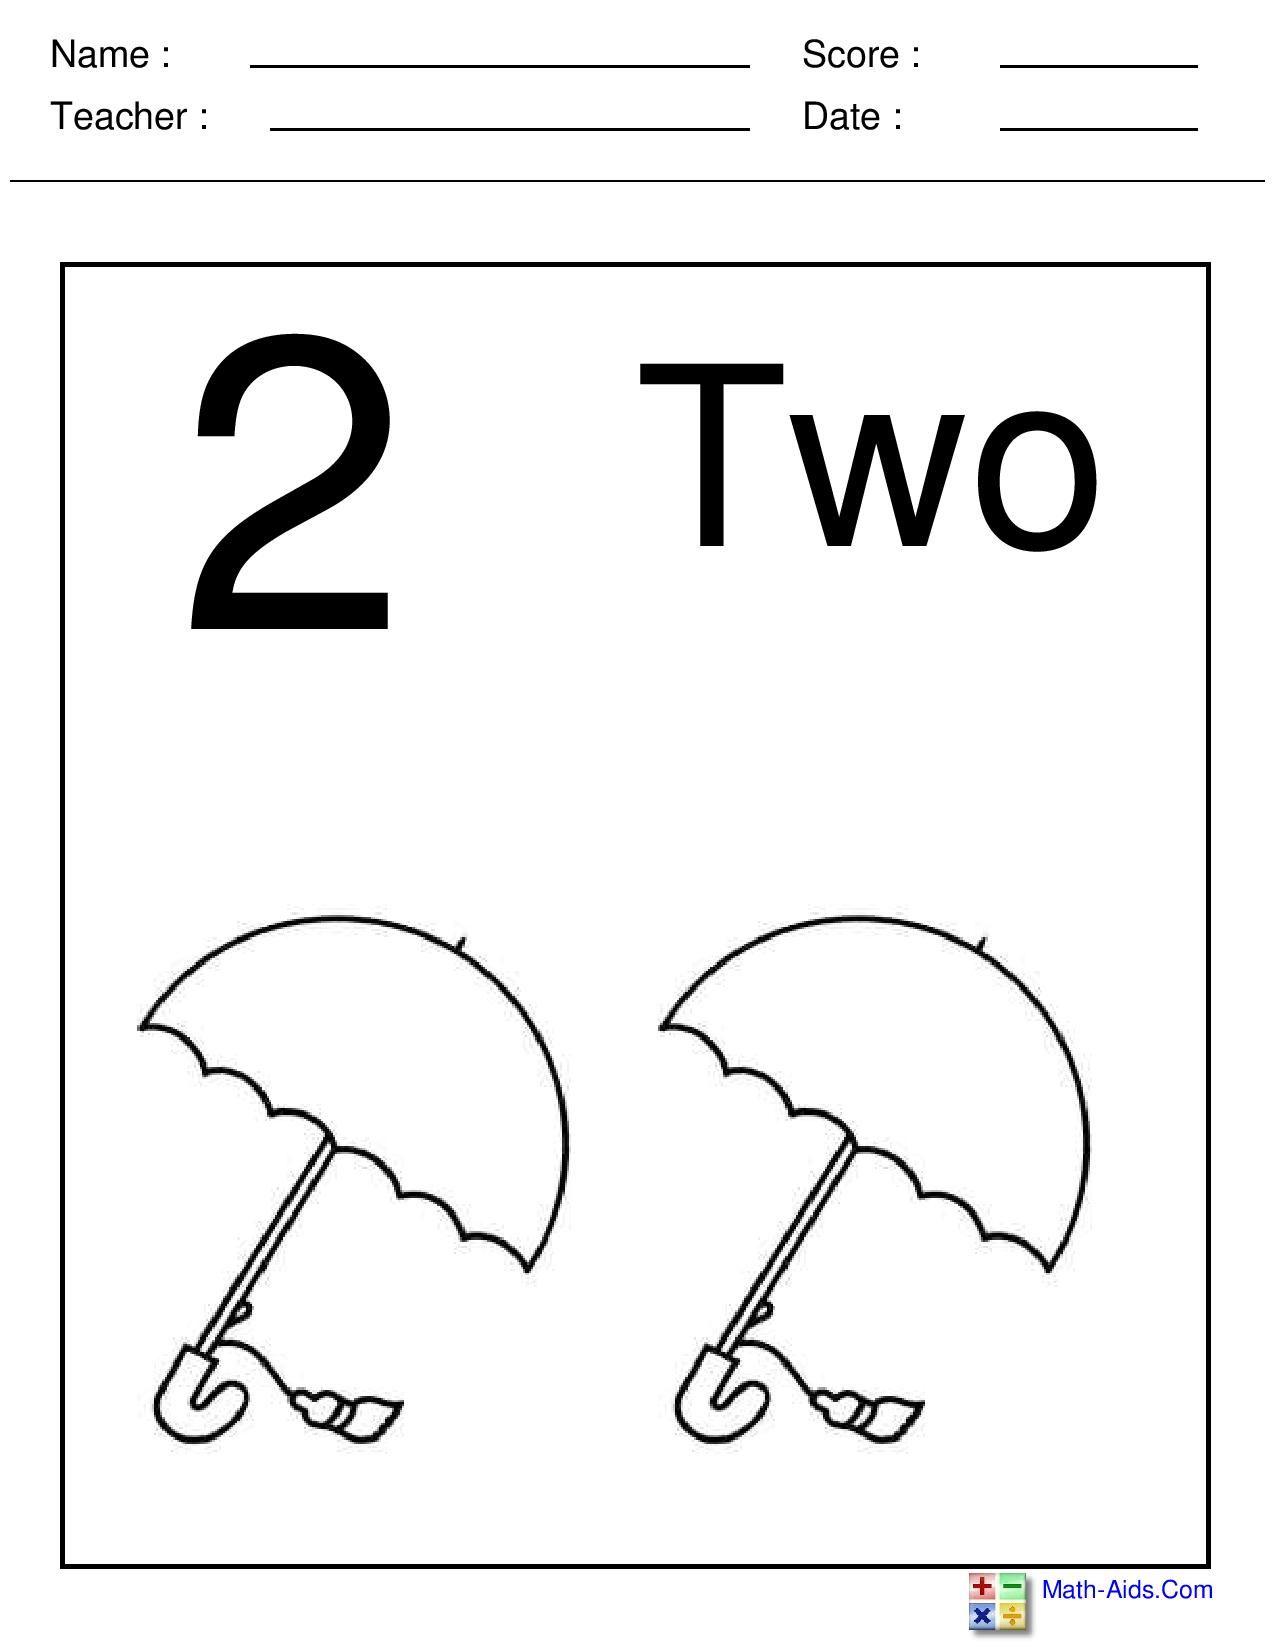 Best 3 Math Worksheets For Kindergarten In